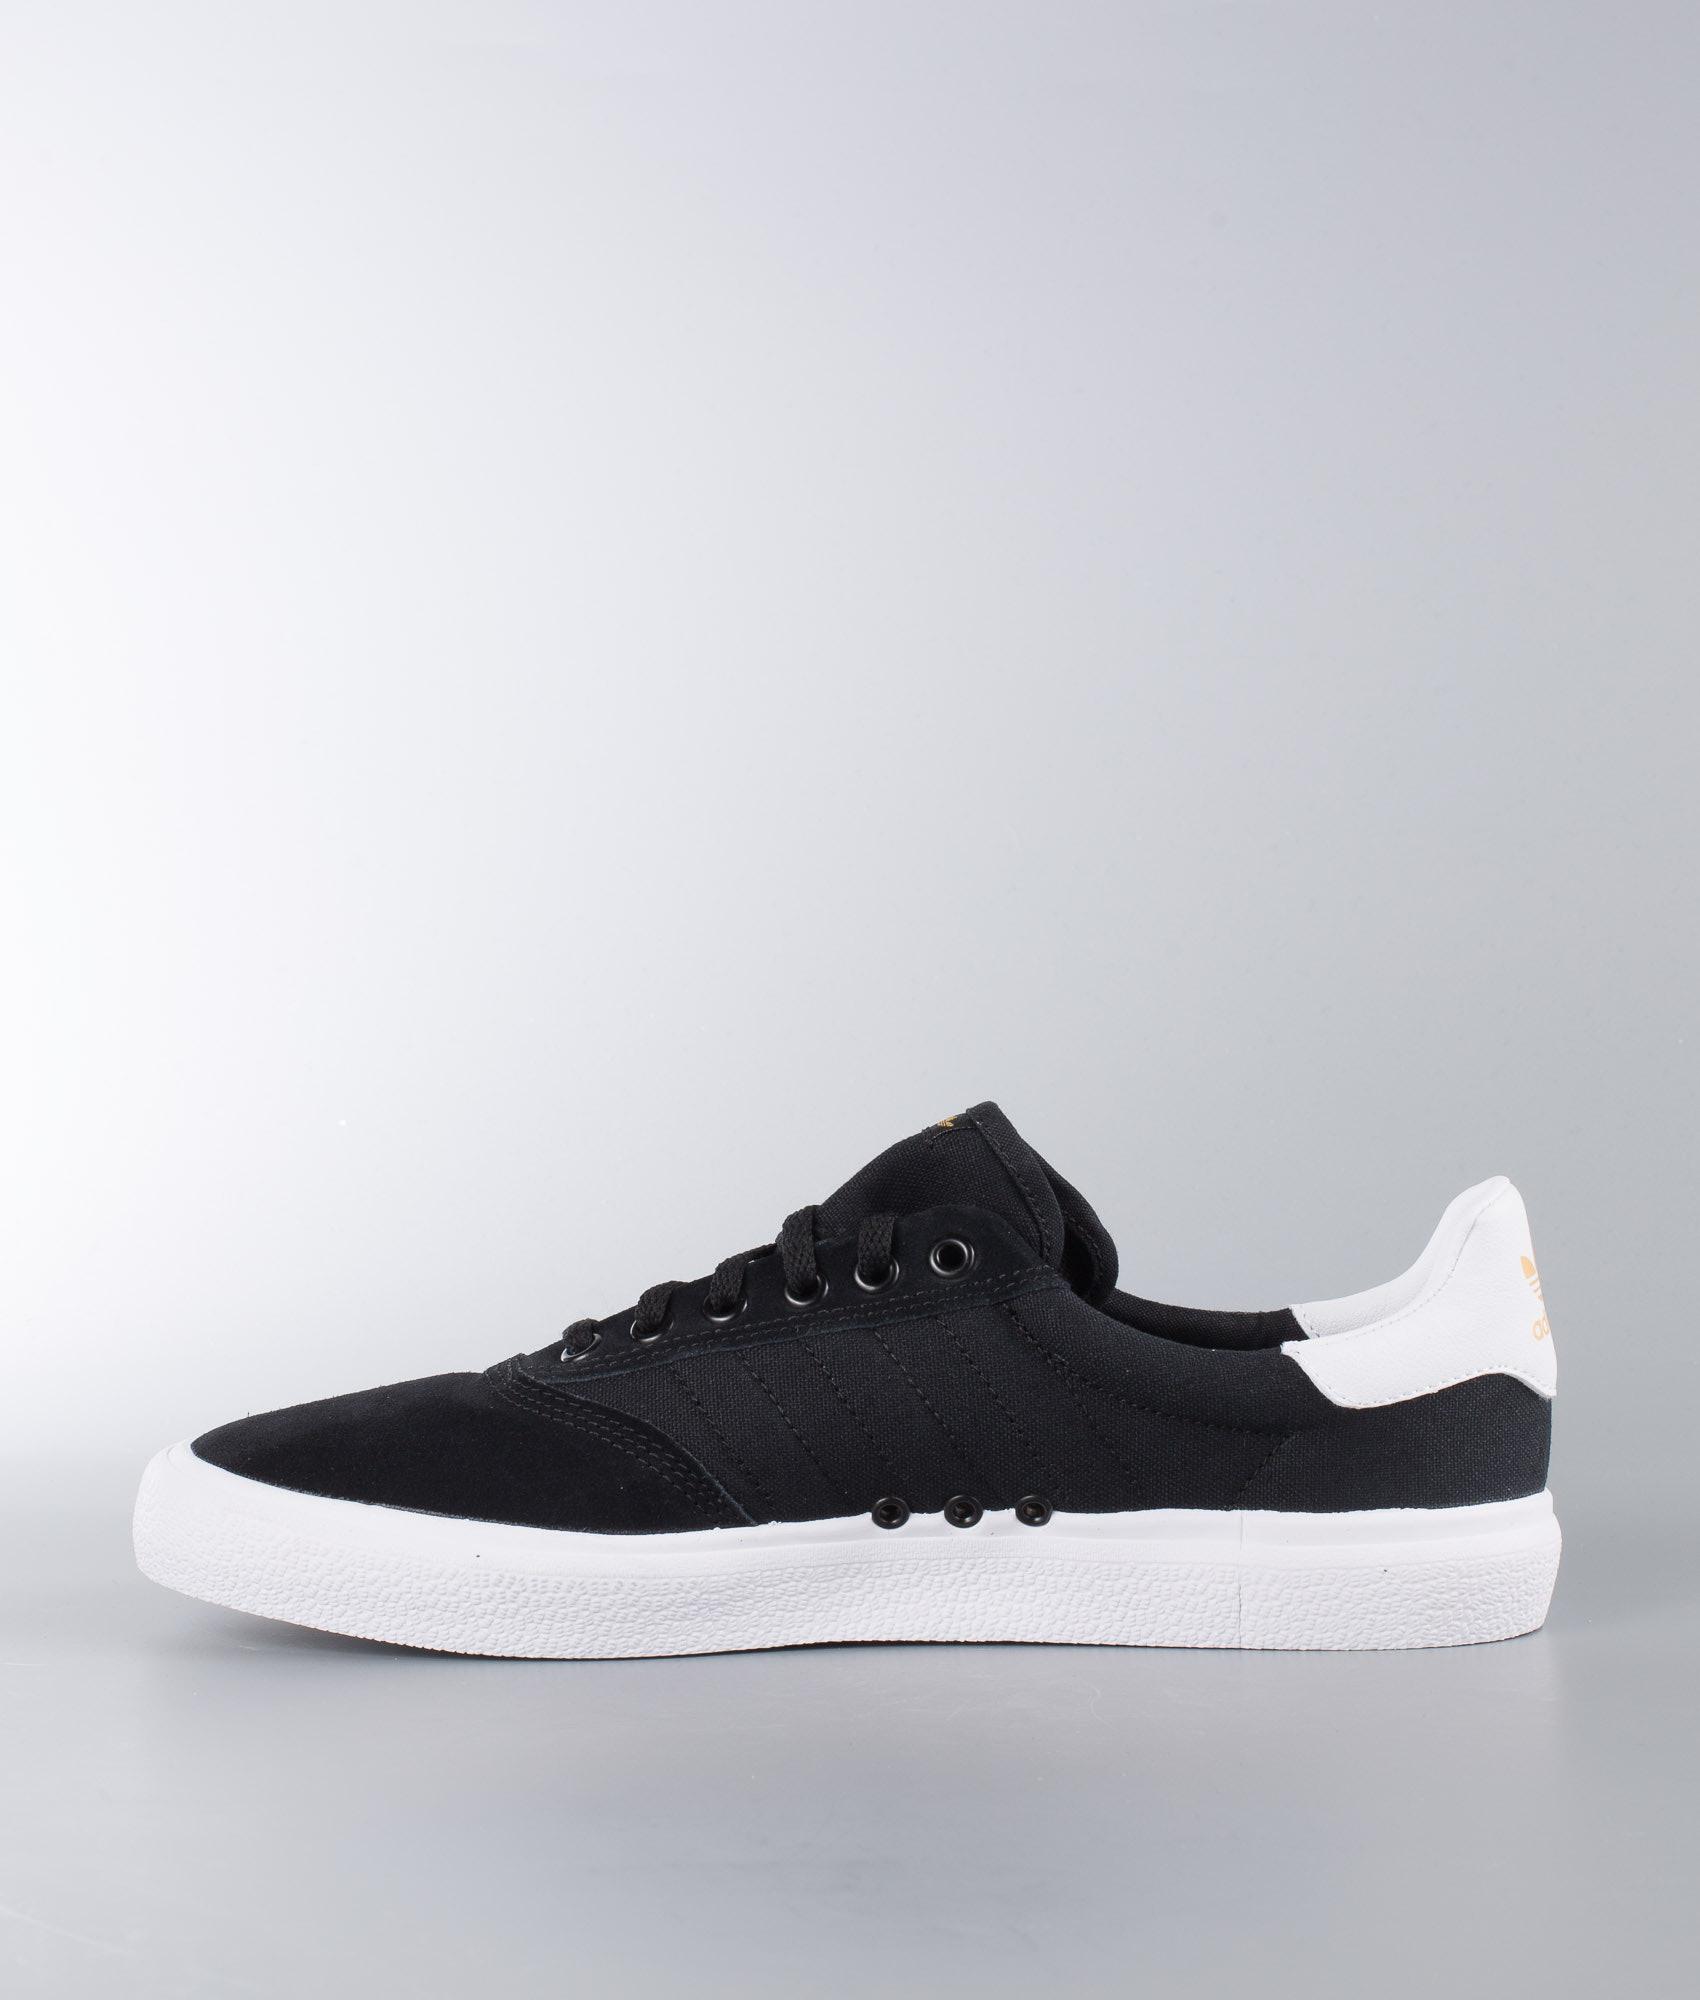 Adidas Skateboarding 3Mc Shoes Core Black Ftwr White Core Black ... c330c50bb